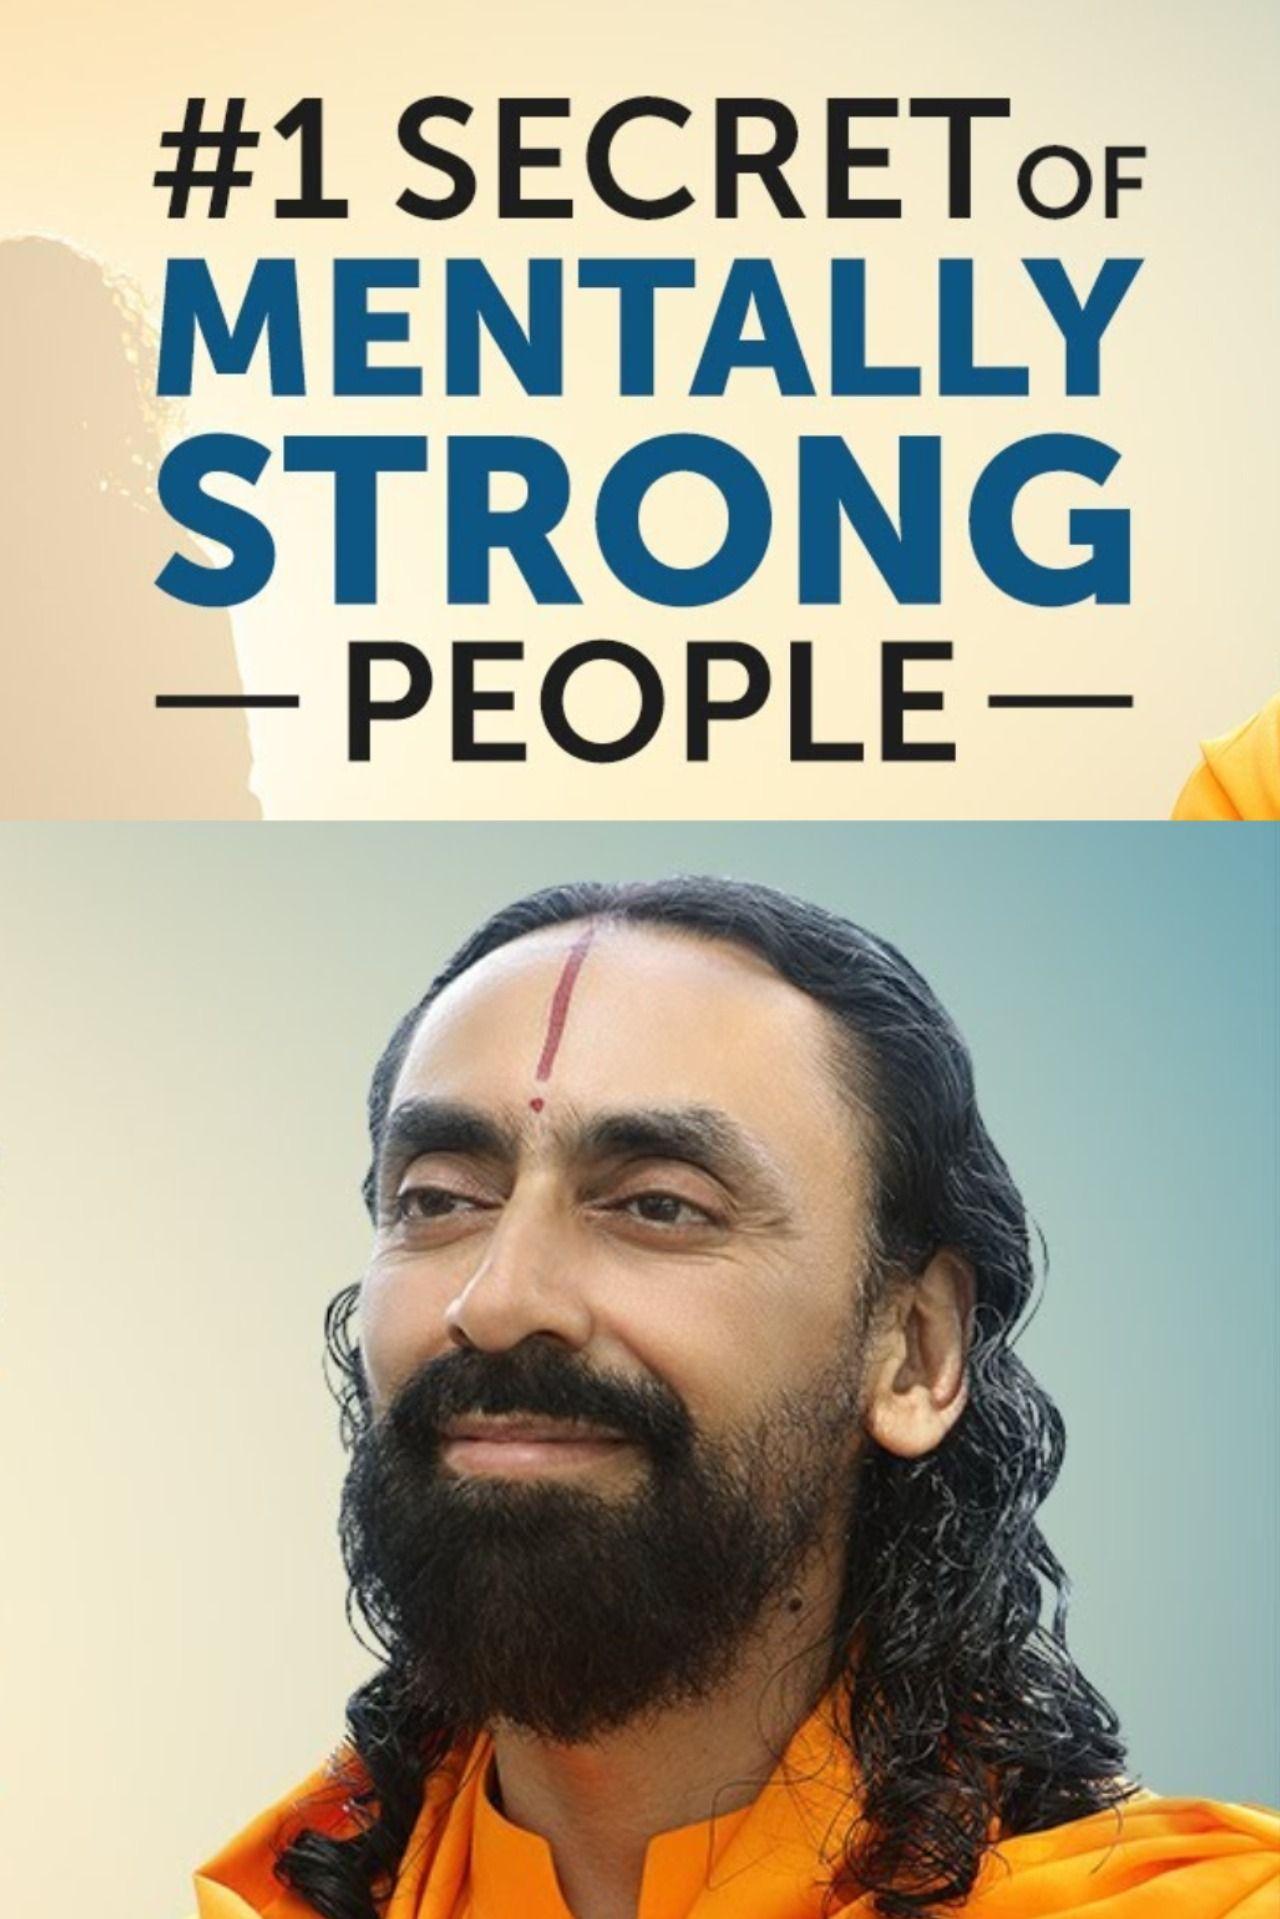 #1 SECRET of MENTALLY STRONG People - Inspirational Video by Swami Mukundananda JKYog